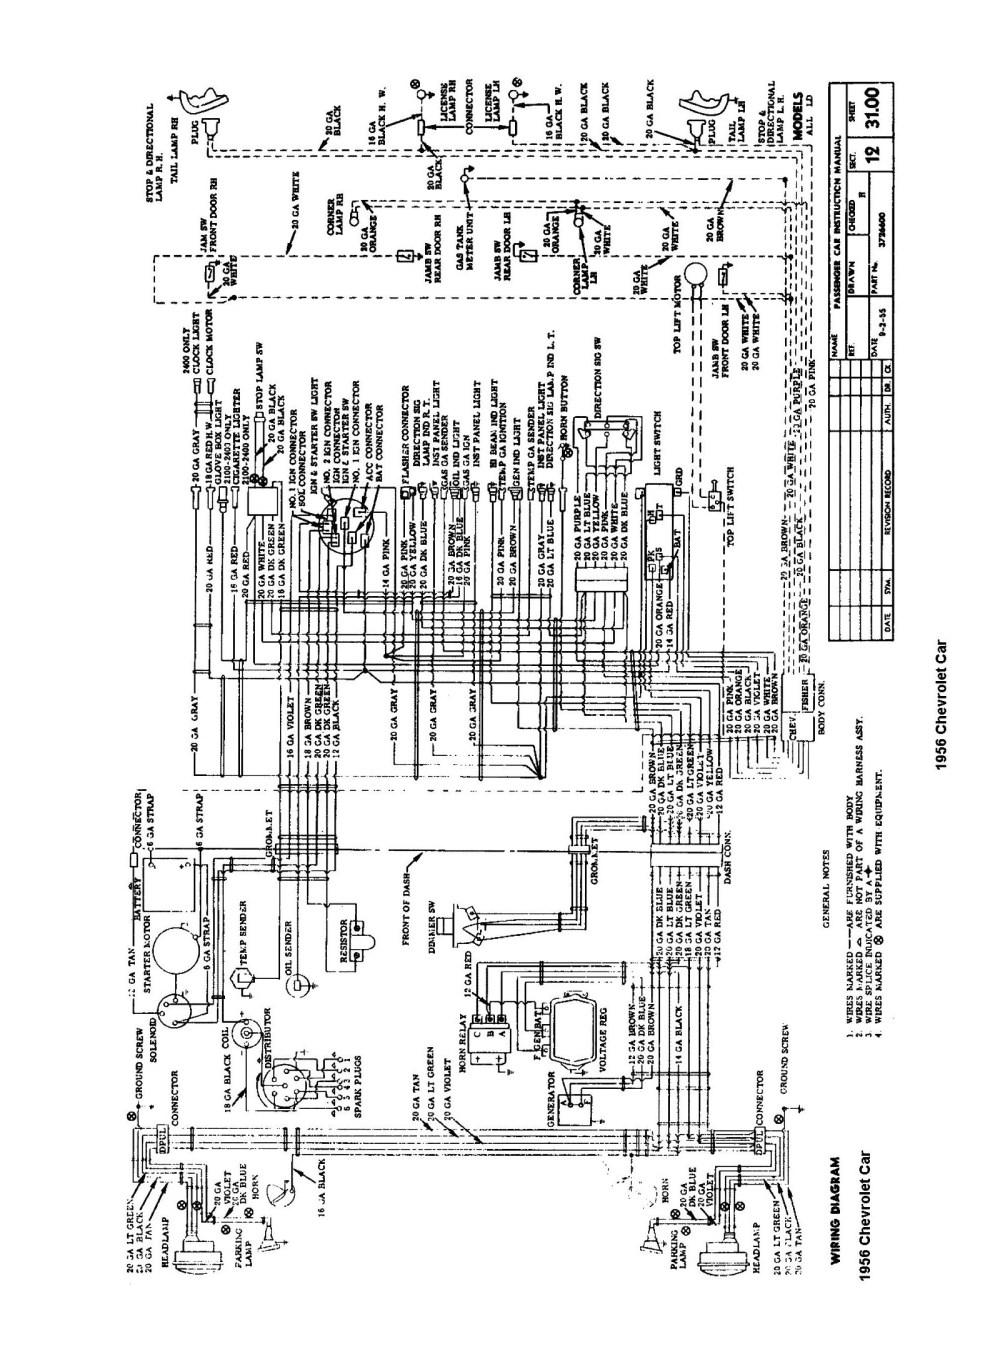 medium resolution of international truck wiring diagram manual download 1956 passenger car wiring 13 h download wiring diagram